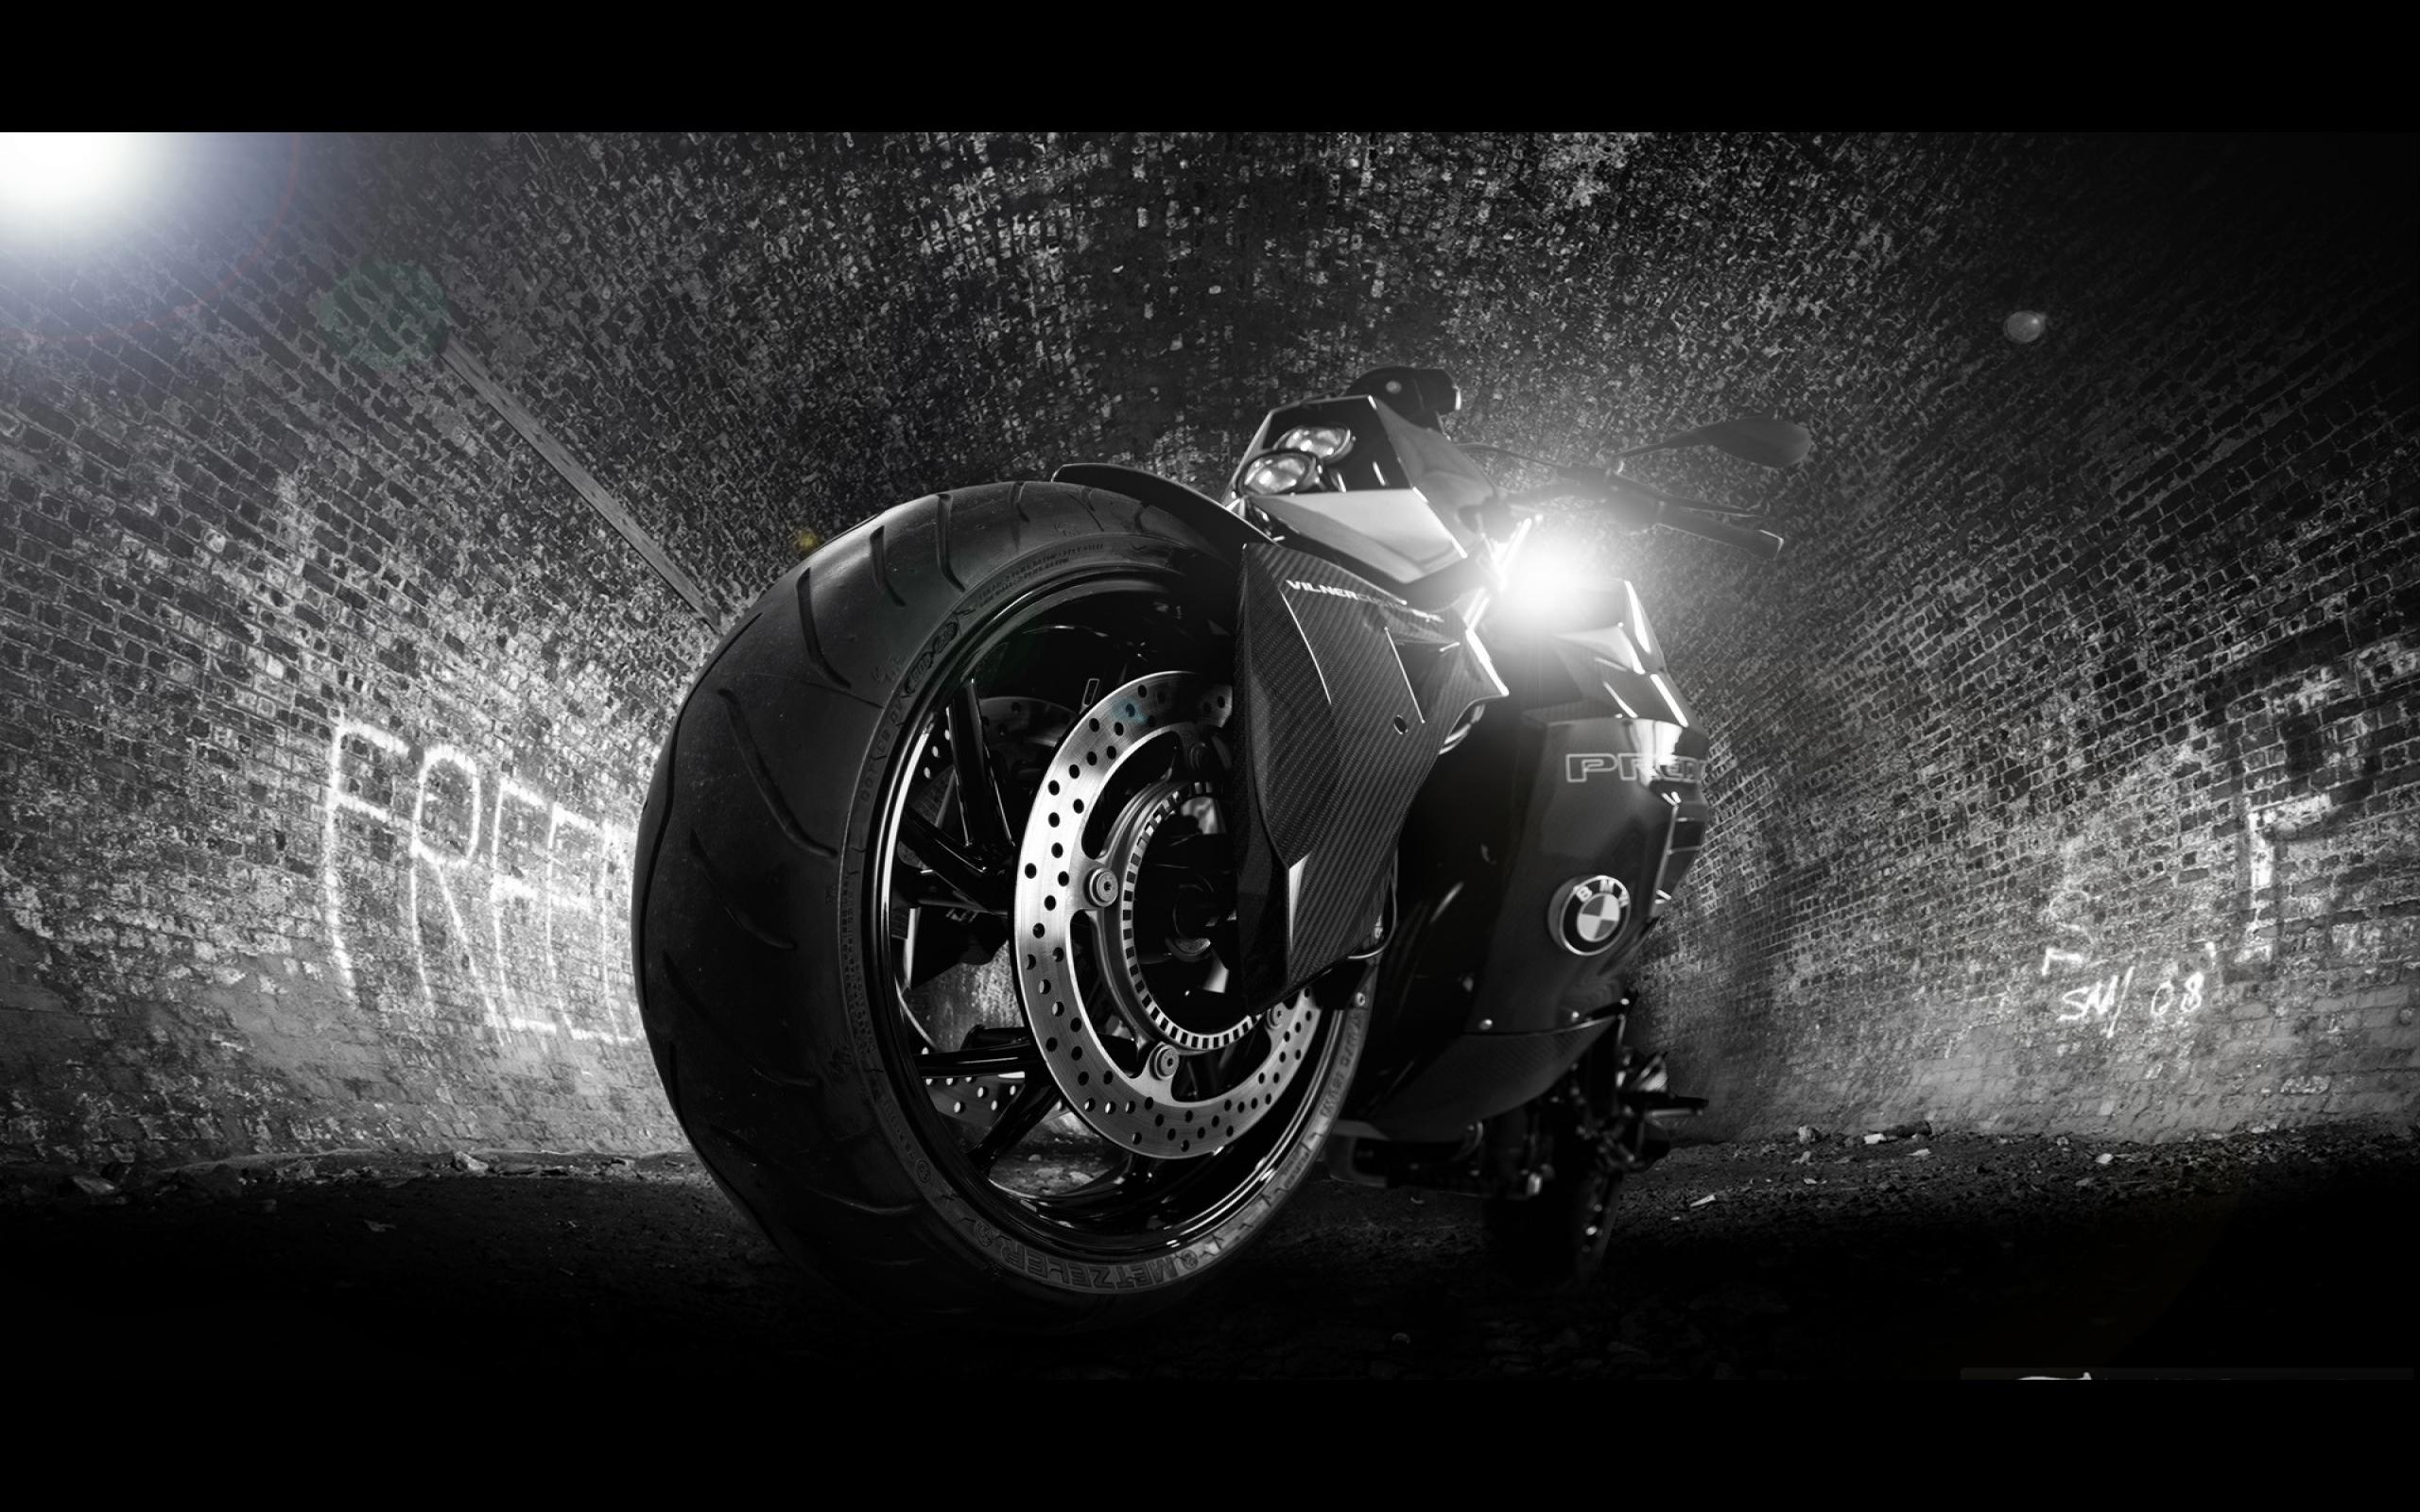 28+ Sportbike Wallpaper By Hind Fogg, GoldWallpapers.com